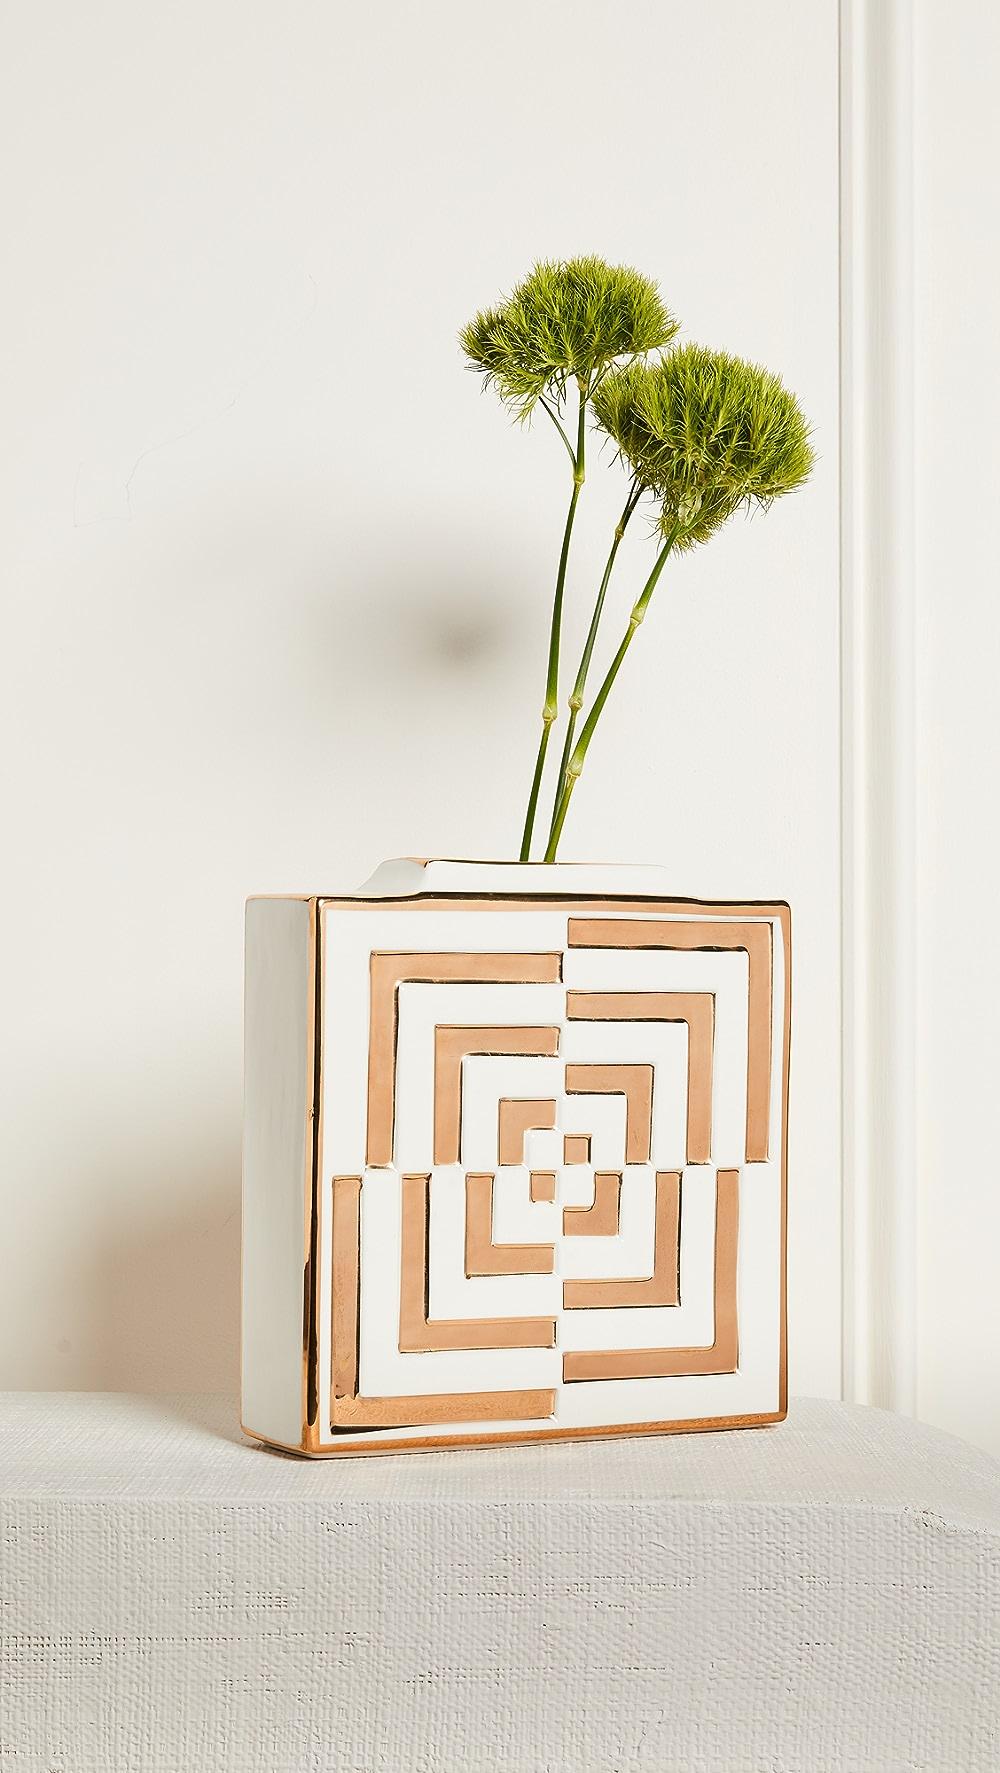 Adroit Jonathan Adler - Futura Op Art Square Vase Luxuriant In Design